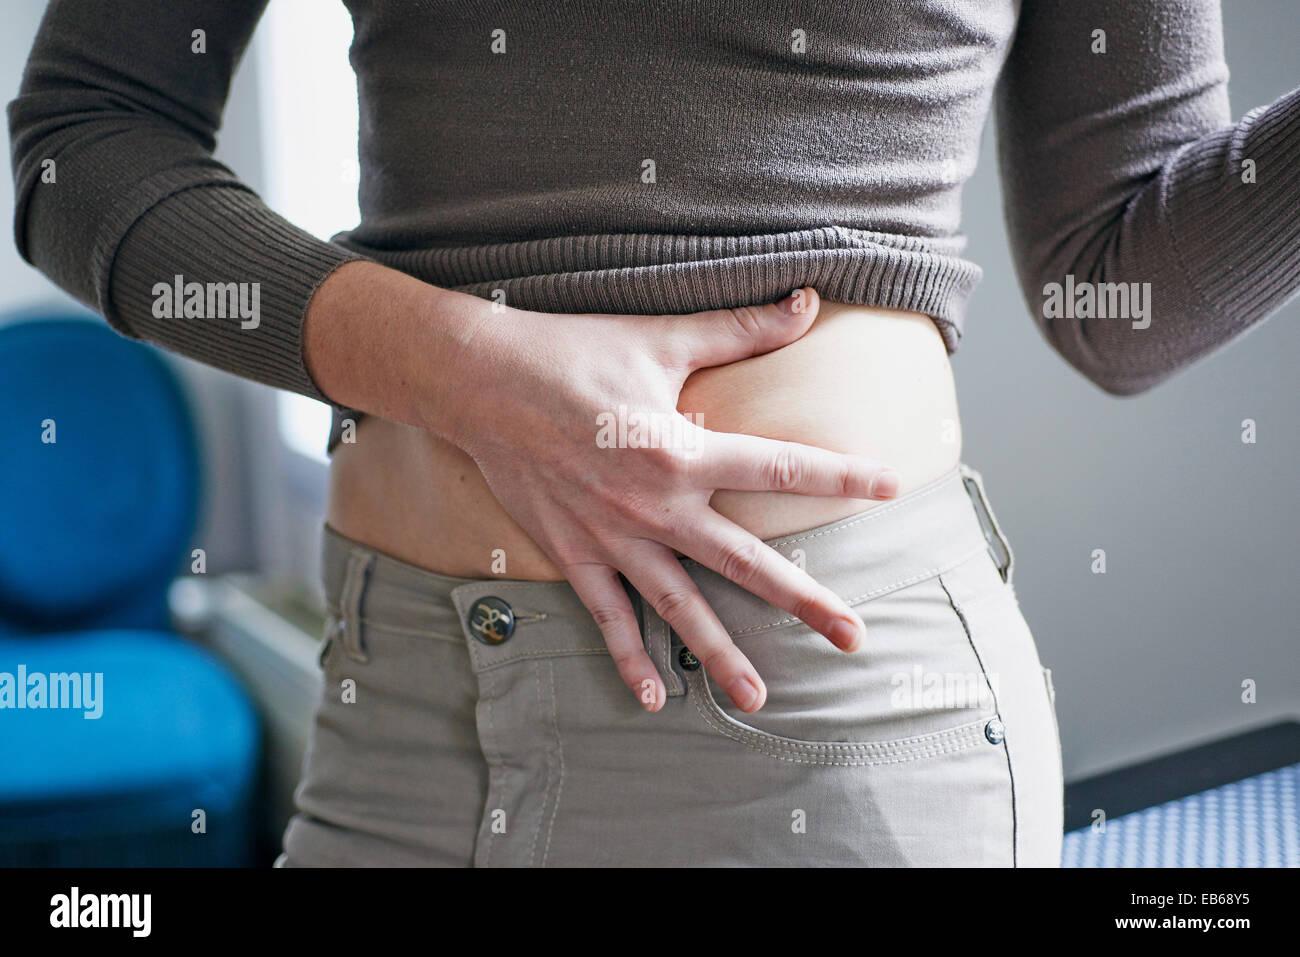 TREATING DIABETES, WOMAN - Stock Image